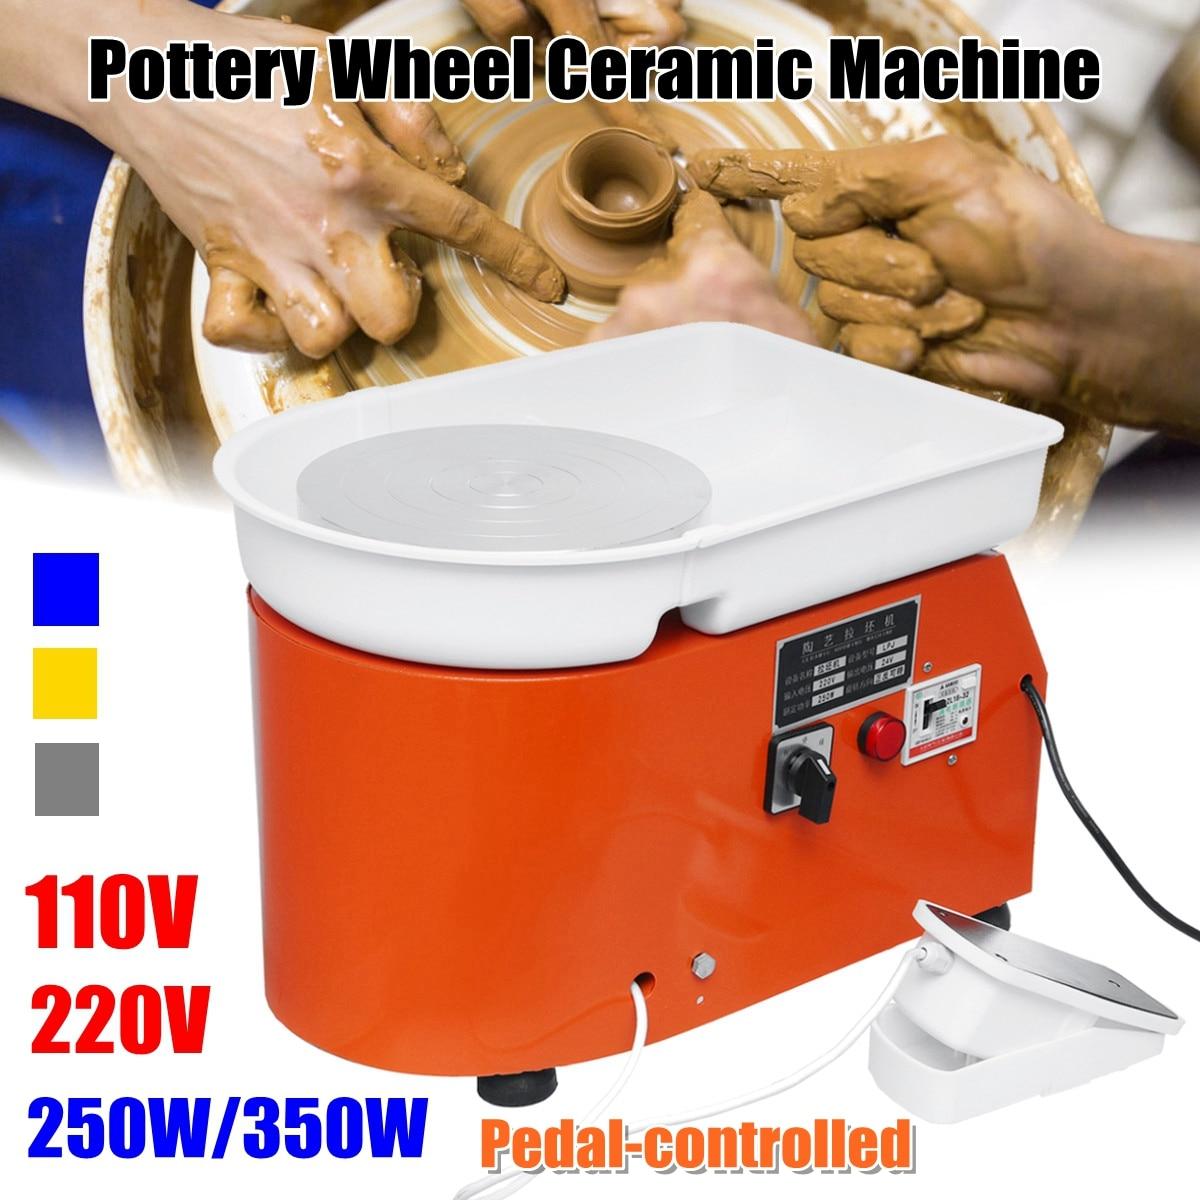 250W/350W Electric Tours Wheel Pottery Machine Ceramic Clay Potter Art For Ceramic Work 110V/220V great wall 350 p4 250w 350w desktop server